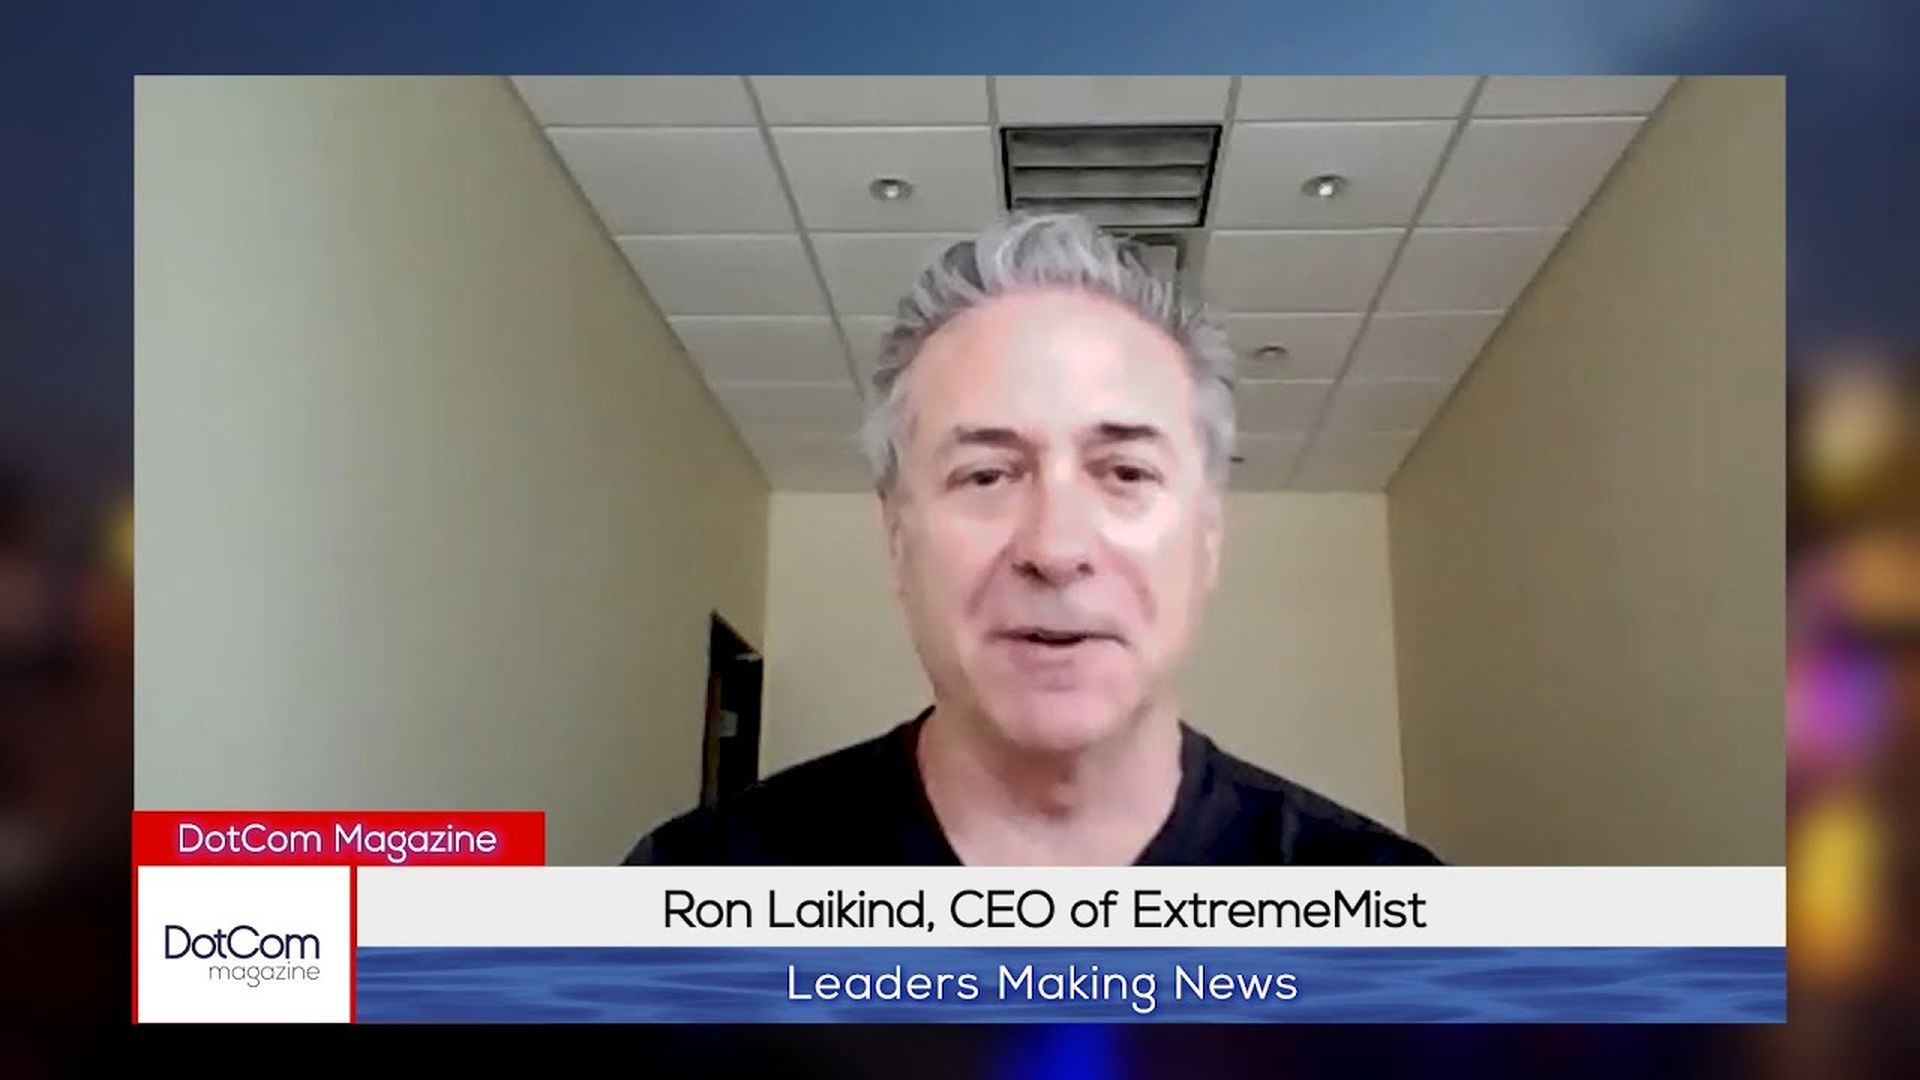 Ron Laikind CEO of ExtremeMist. A DotCom Magazine Exclusive Interview.